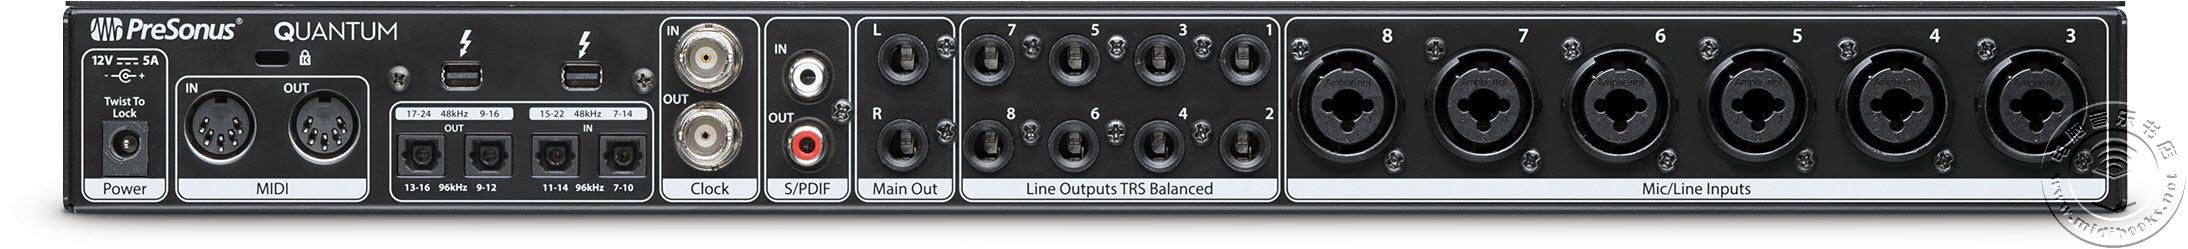 Presonus发布旗舰级雷电(Thunderbolt)音频接口 Quantum(视频)